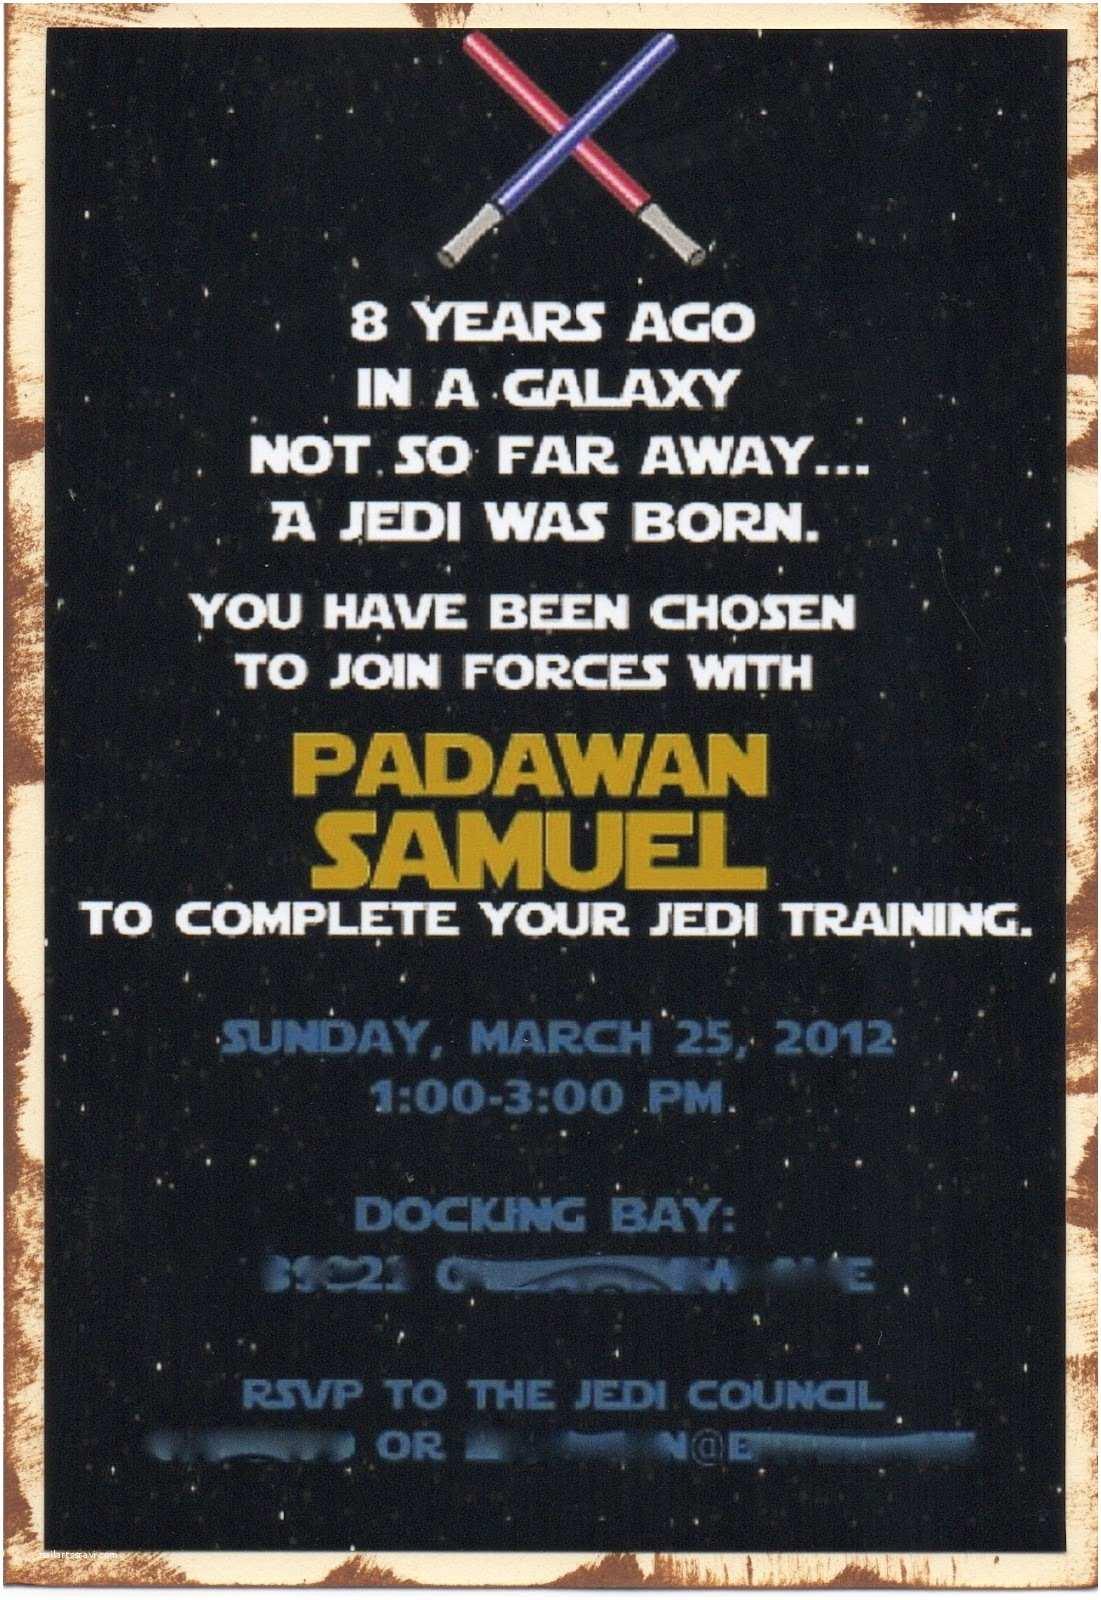 Star Wars Birthday Invitation Another Babin Creation Star Wars Birthday Invitation